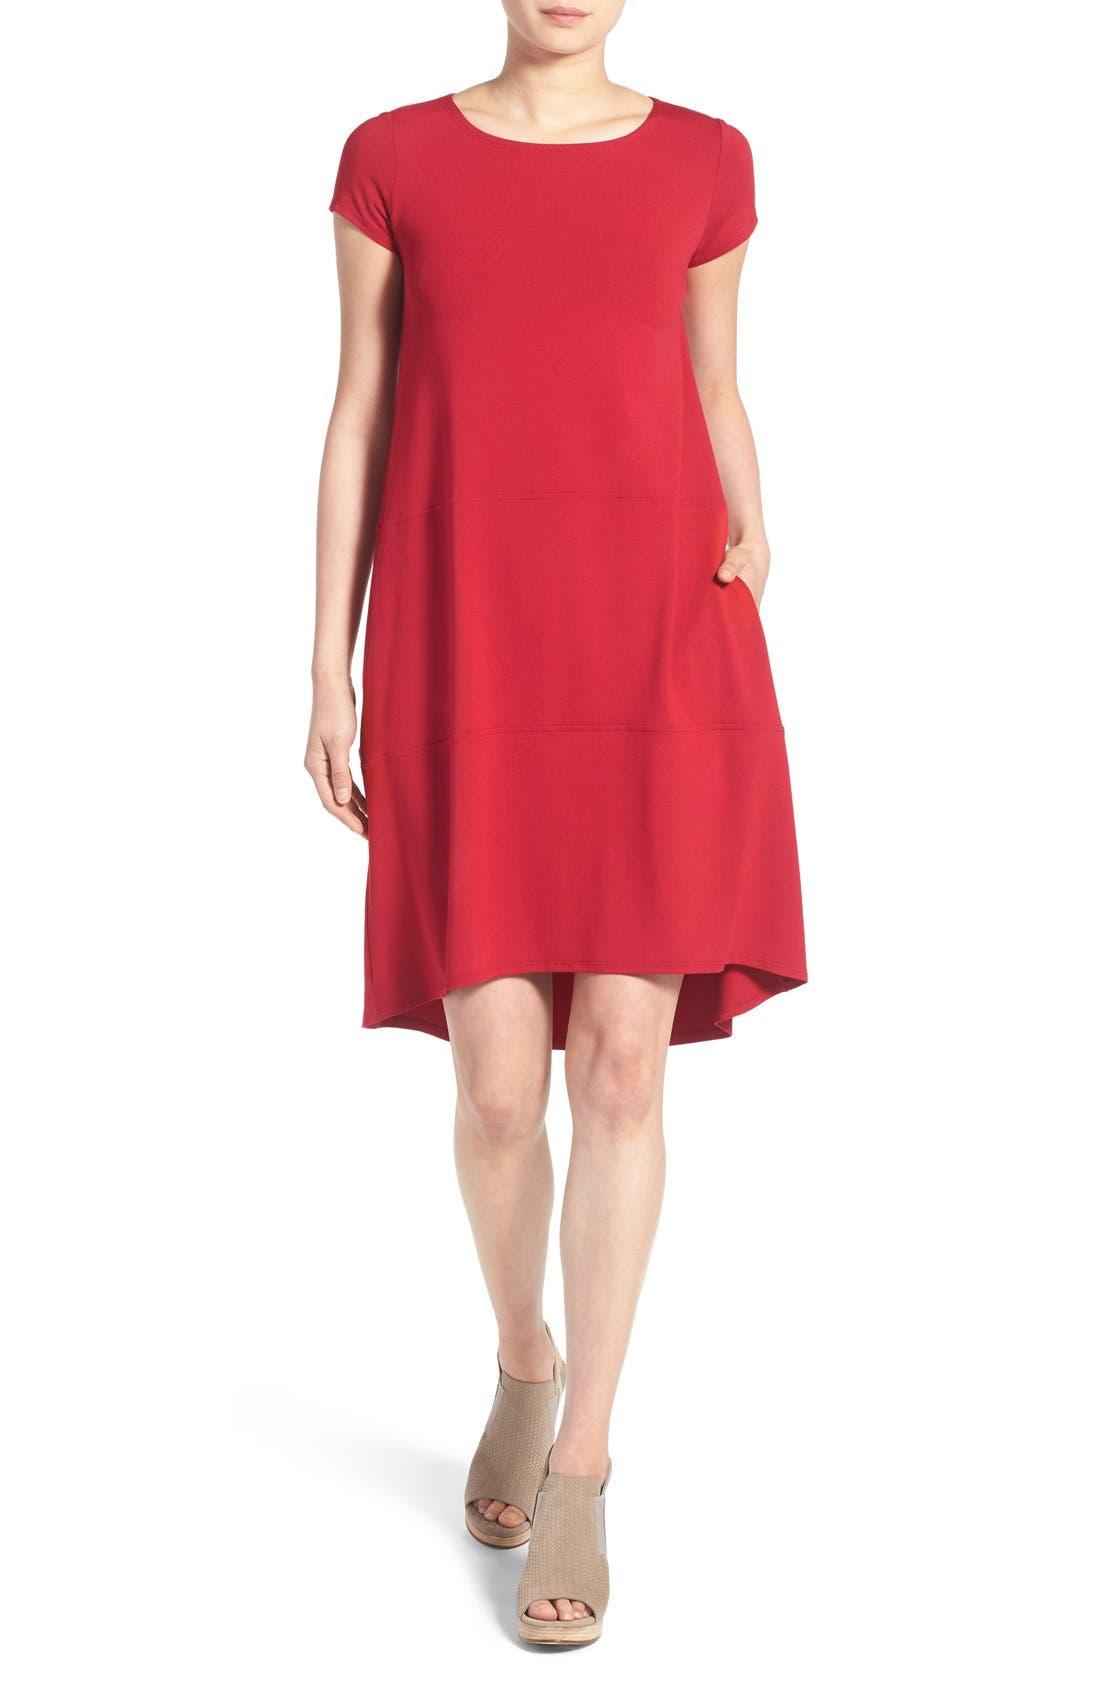 Main Image - Eileen Fisher Bateau Neck Cap Sleeve Dress (Regular & Petite)